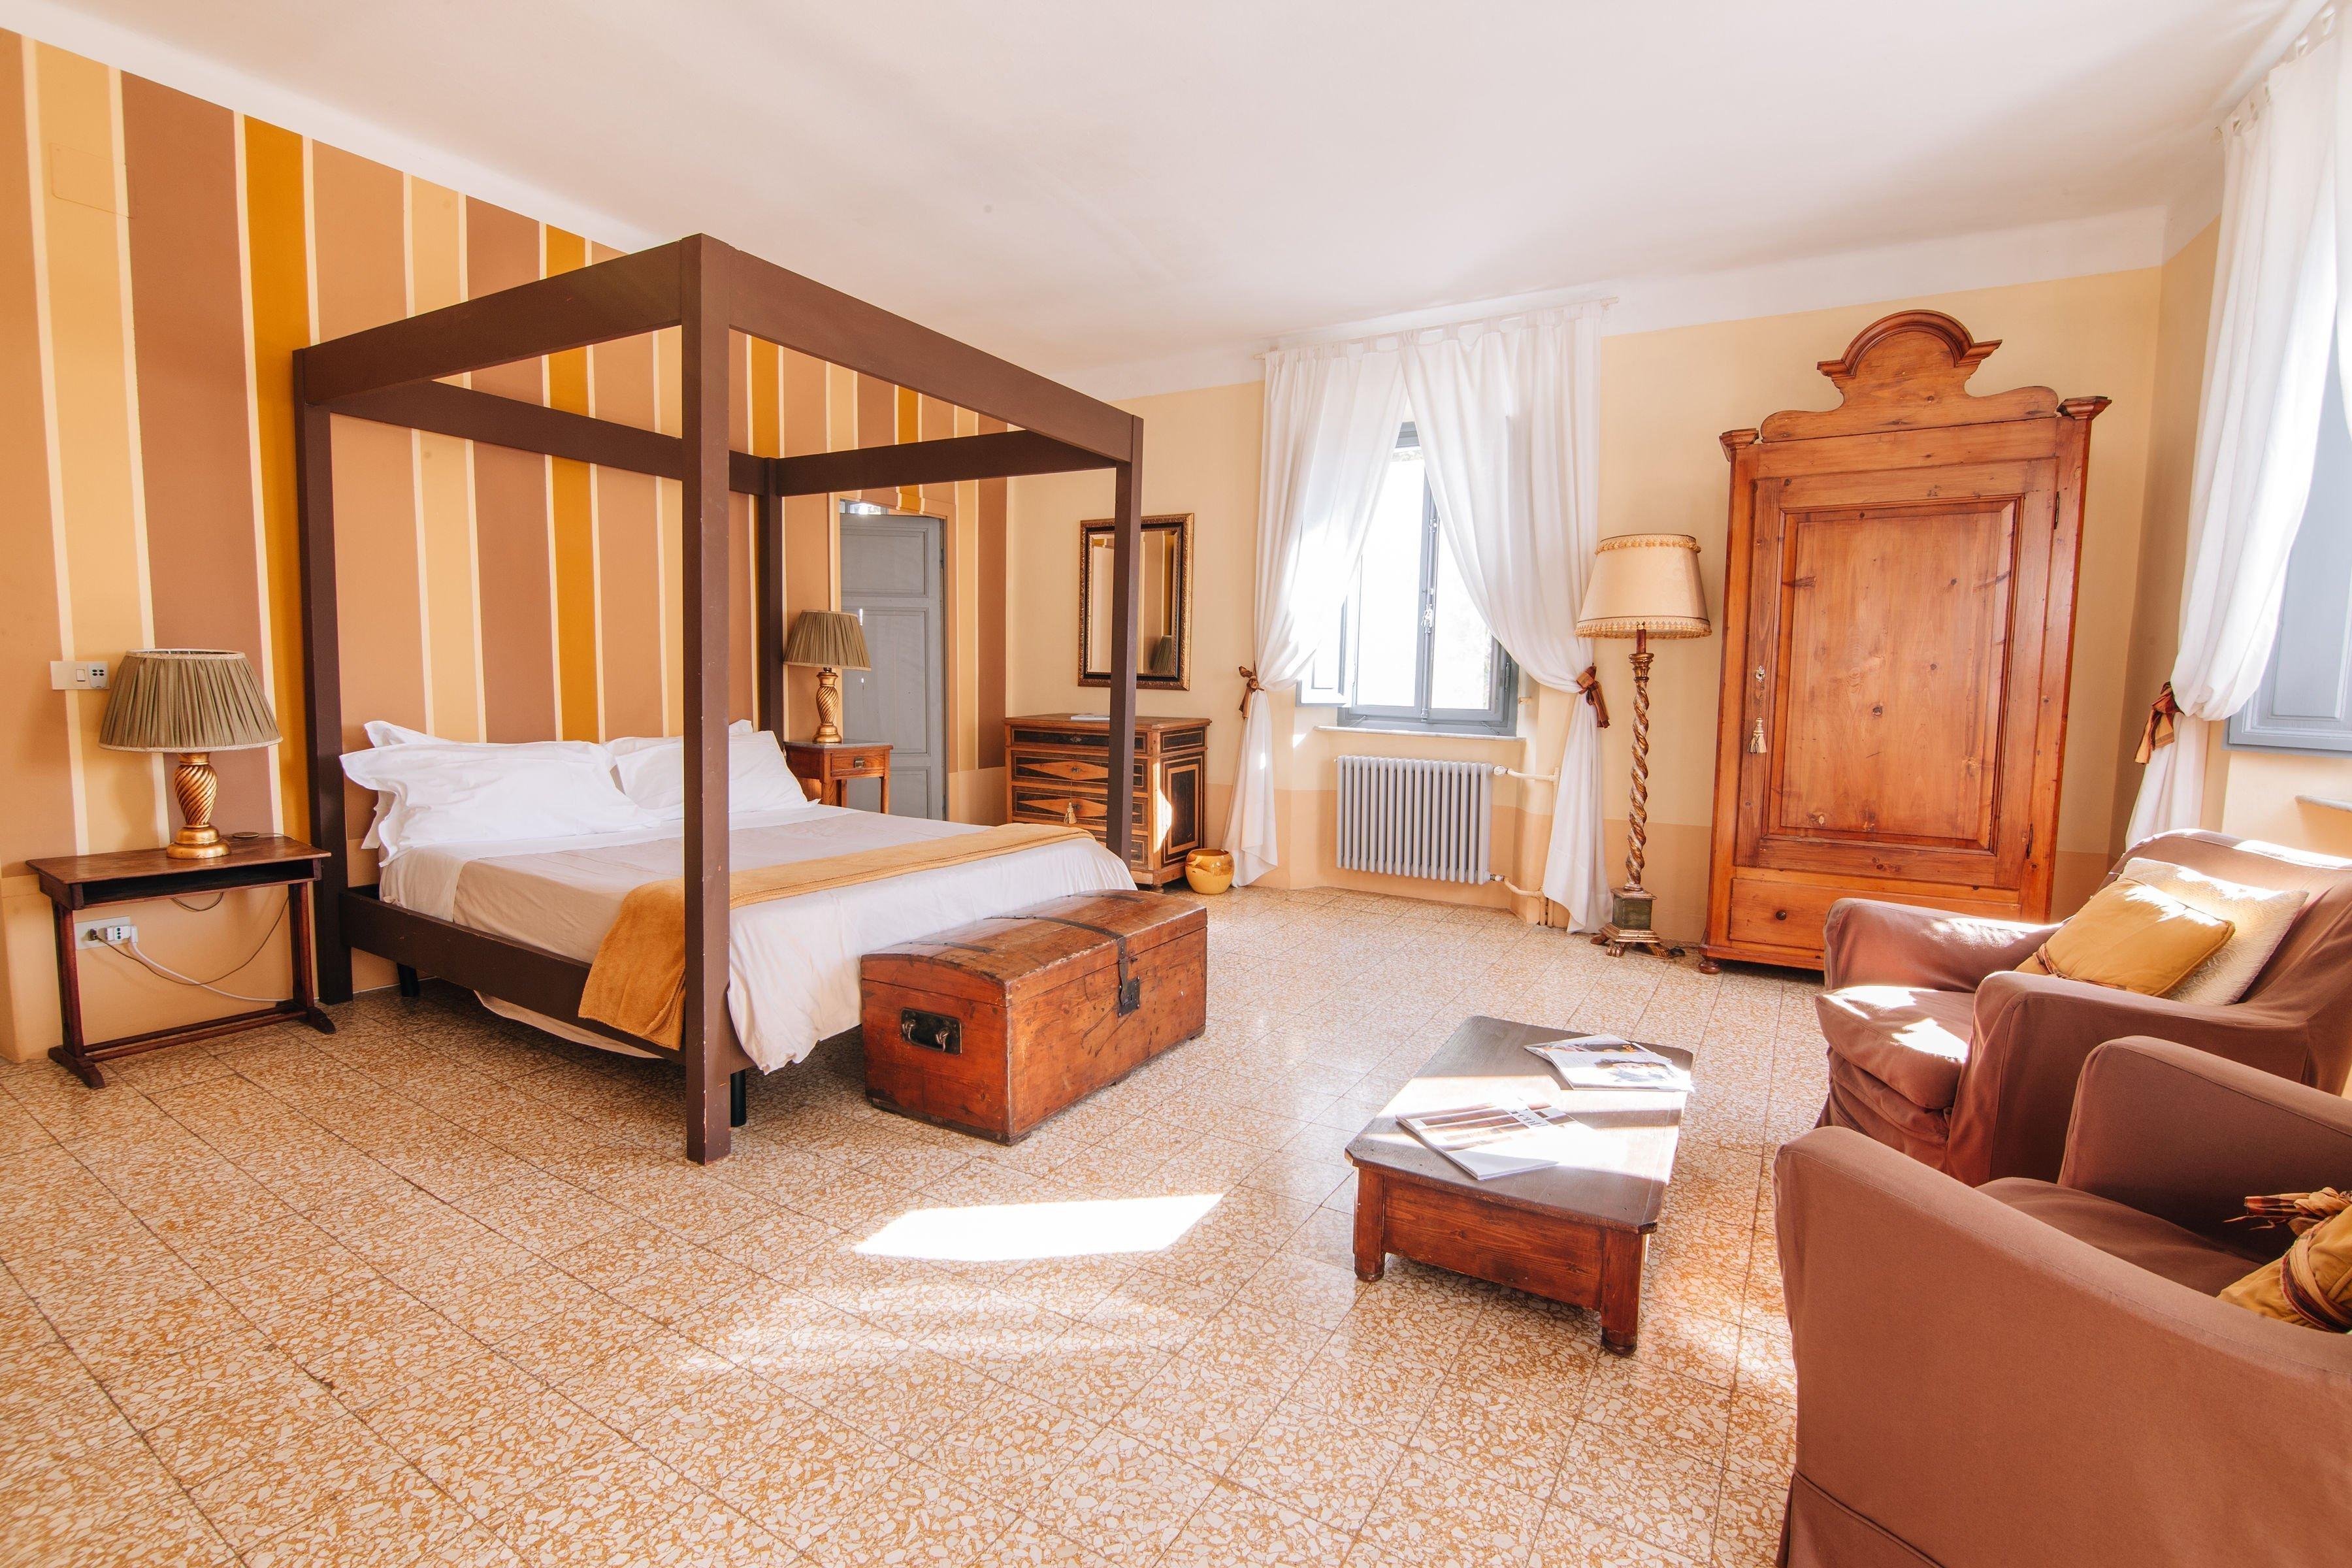 Suite Gialla nel Bed and Breakfast in Versilia (Toscana ...